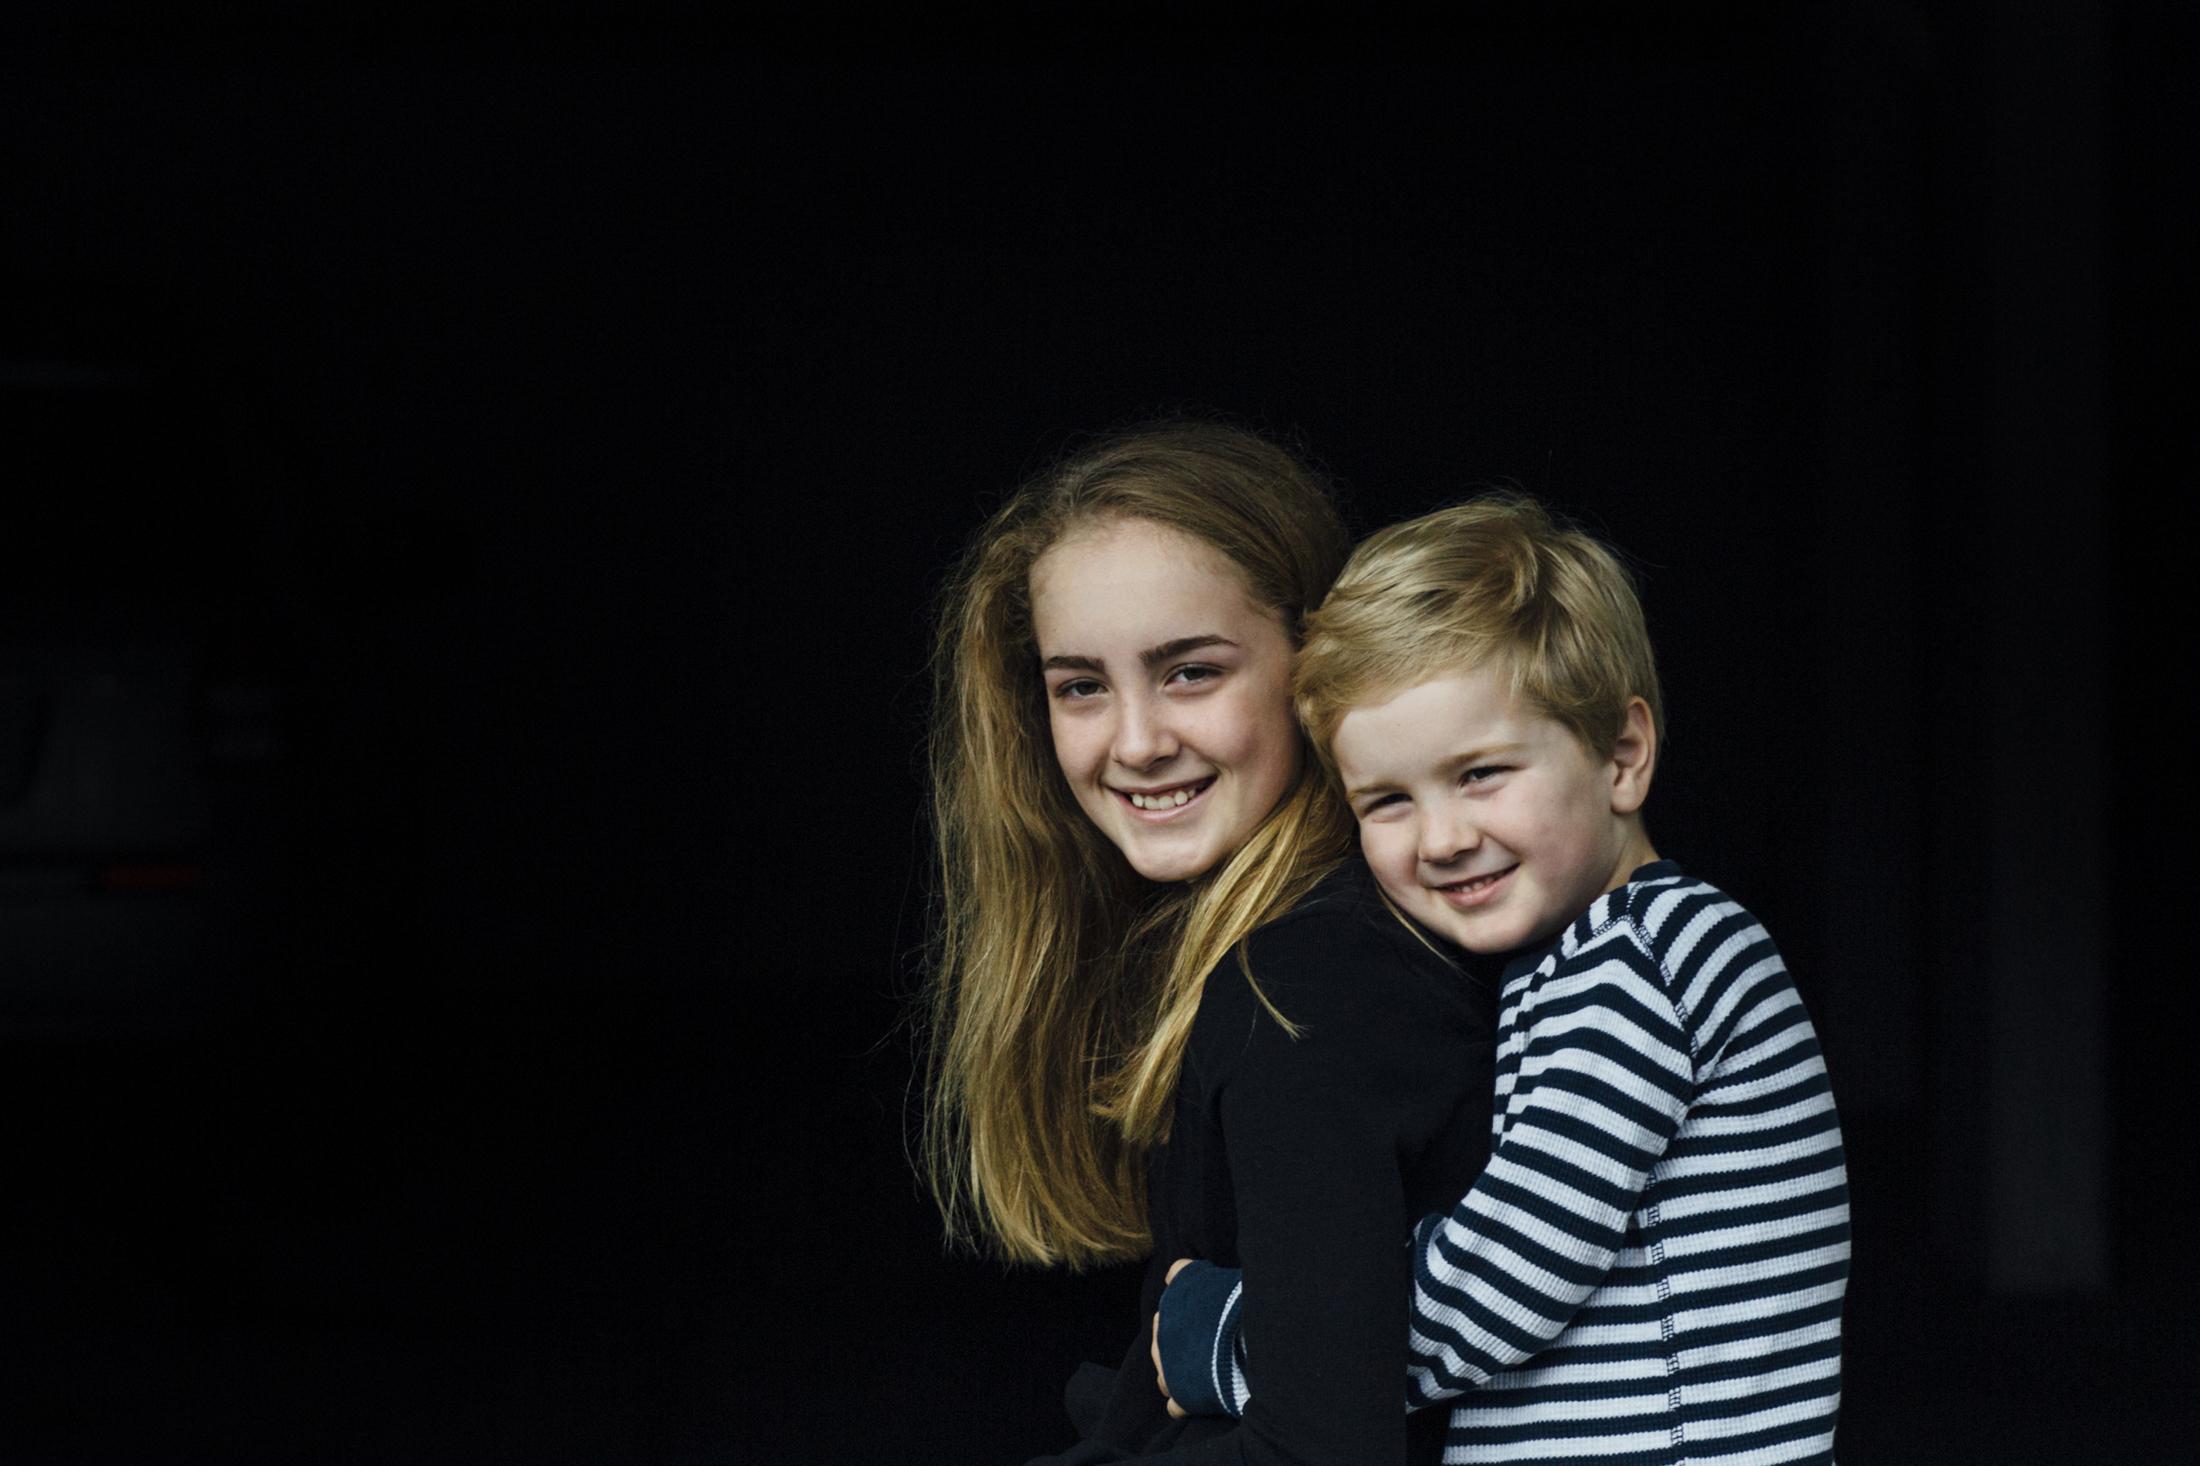 mark_taylor_sydney_family_photography_morffew-4.jpg